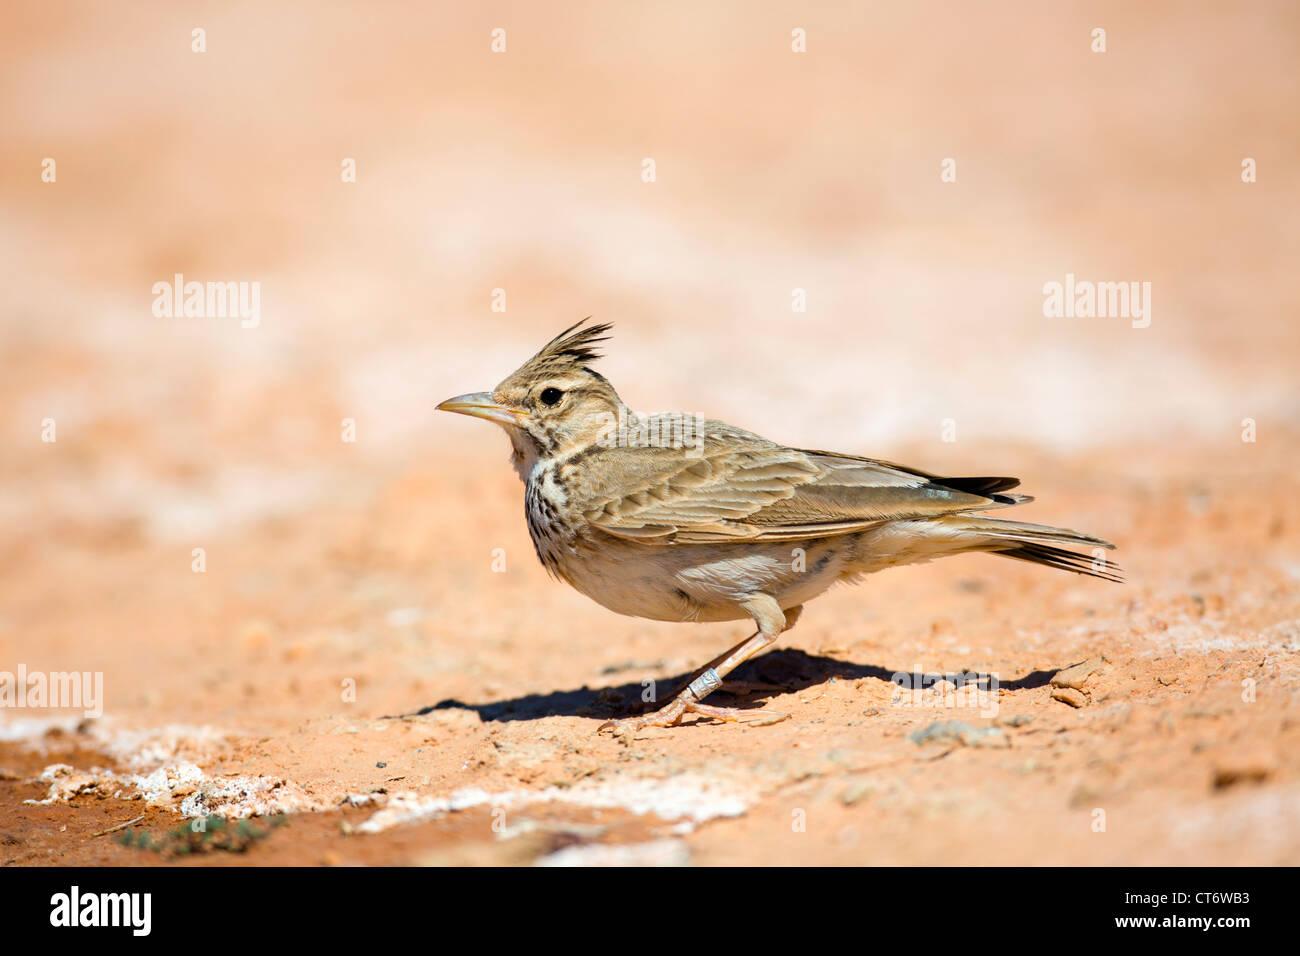 Galerida cristata Crested Lark; Espagne; Photo Stock